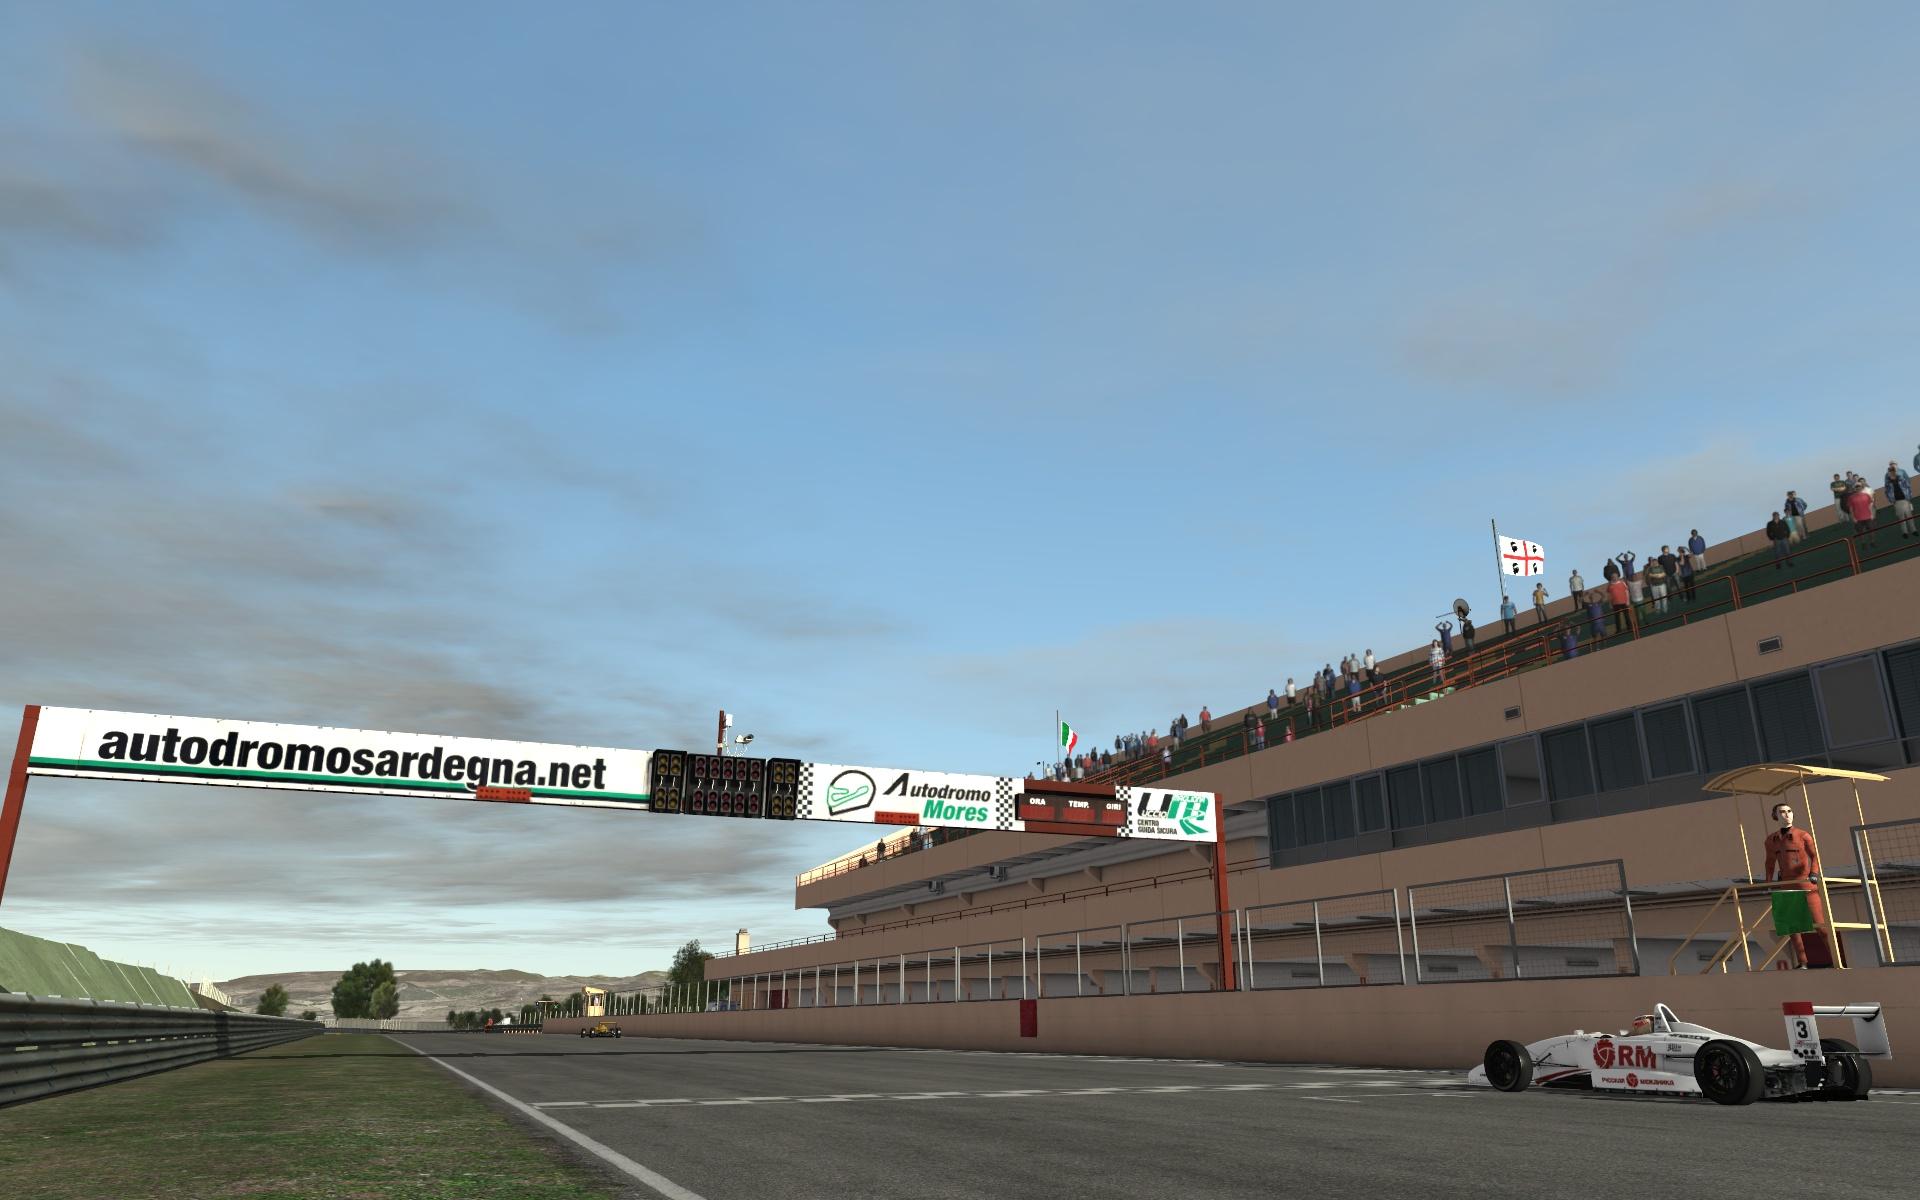 Autodromo di Mores v1.6 Update.jpg